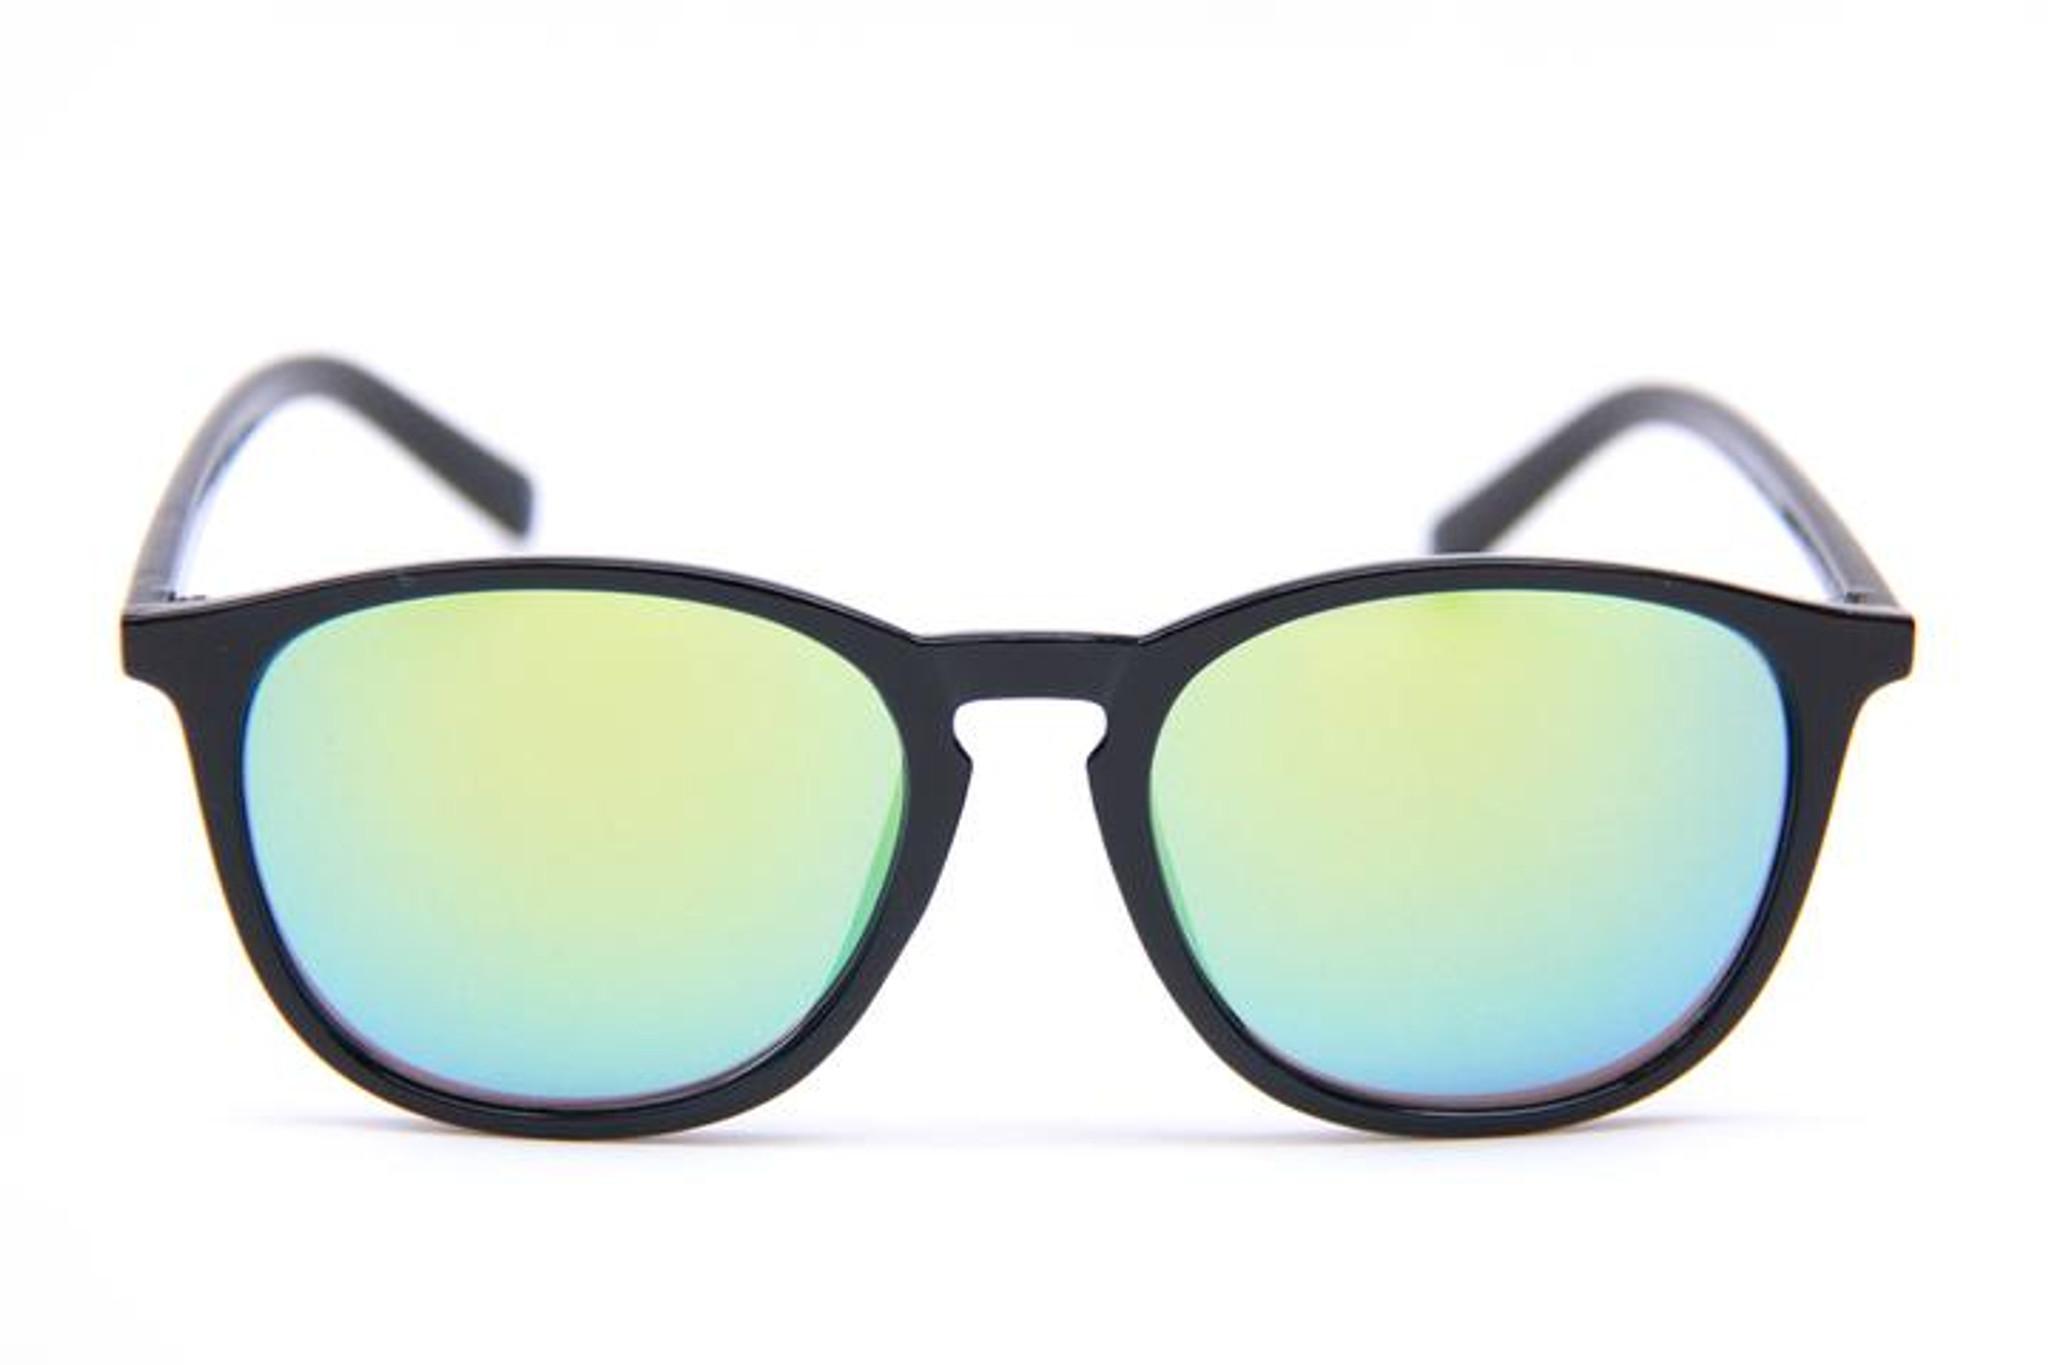 Happy Hour Flap Jacks Black Gloss Yellow Mirror Shades Sunglasses